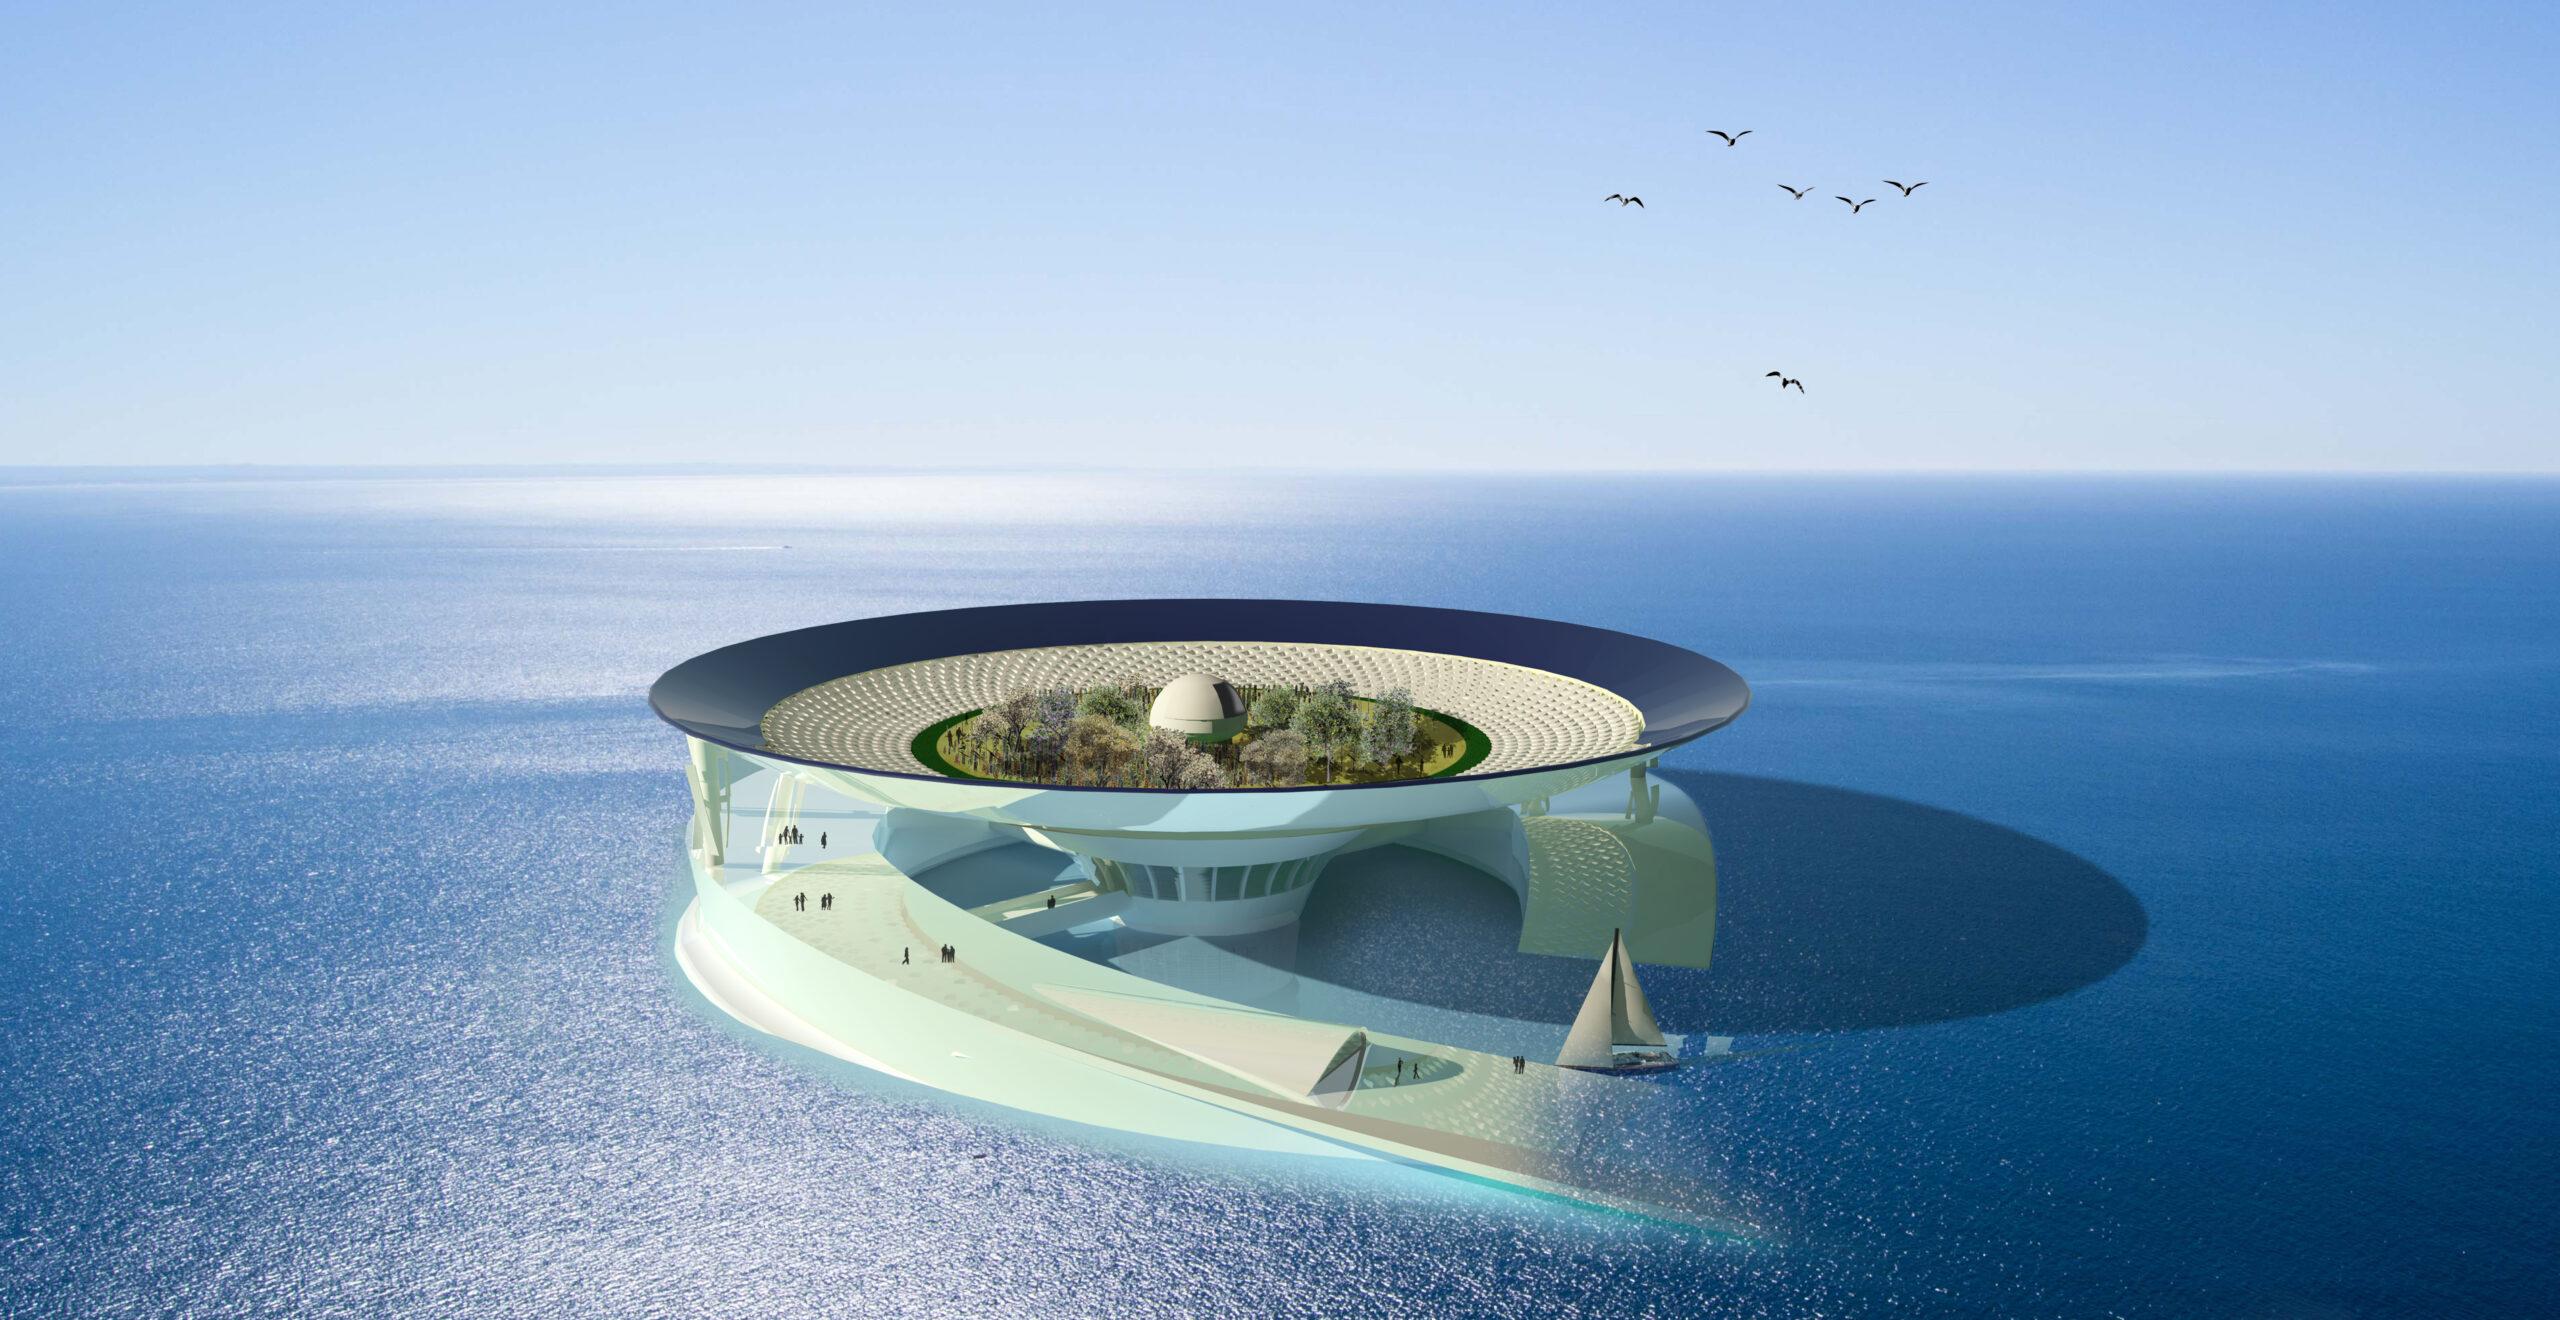 SEA STEM, Mathieu Collos Architecture